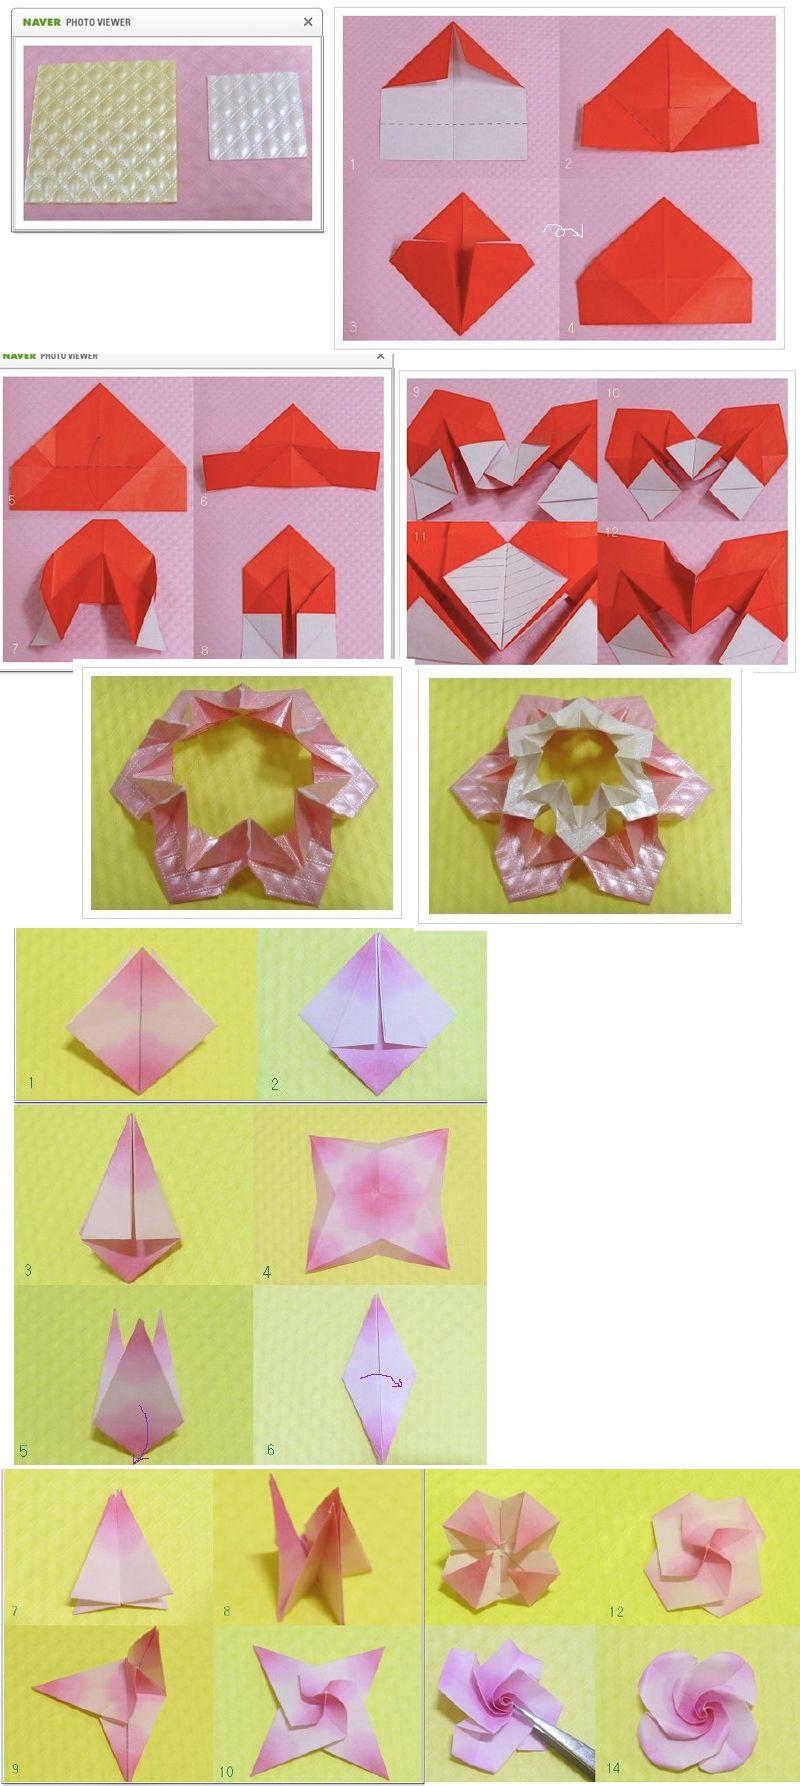 Modular Rose Topped Decoration Http Sjrenoircom 50010575677 Origami Parrotdiagram By Barth Dunkan Ecorigami 5 Cm Also See Https Aspiringfolderwordpresscom 2011 10 08 Ornament